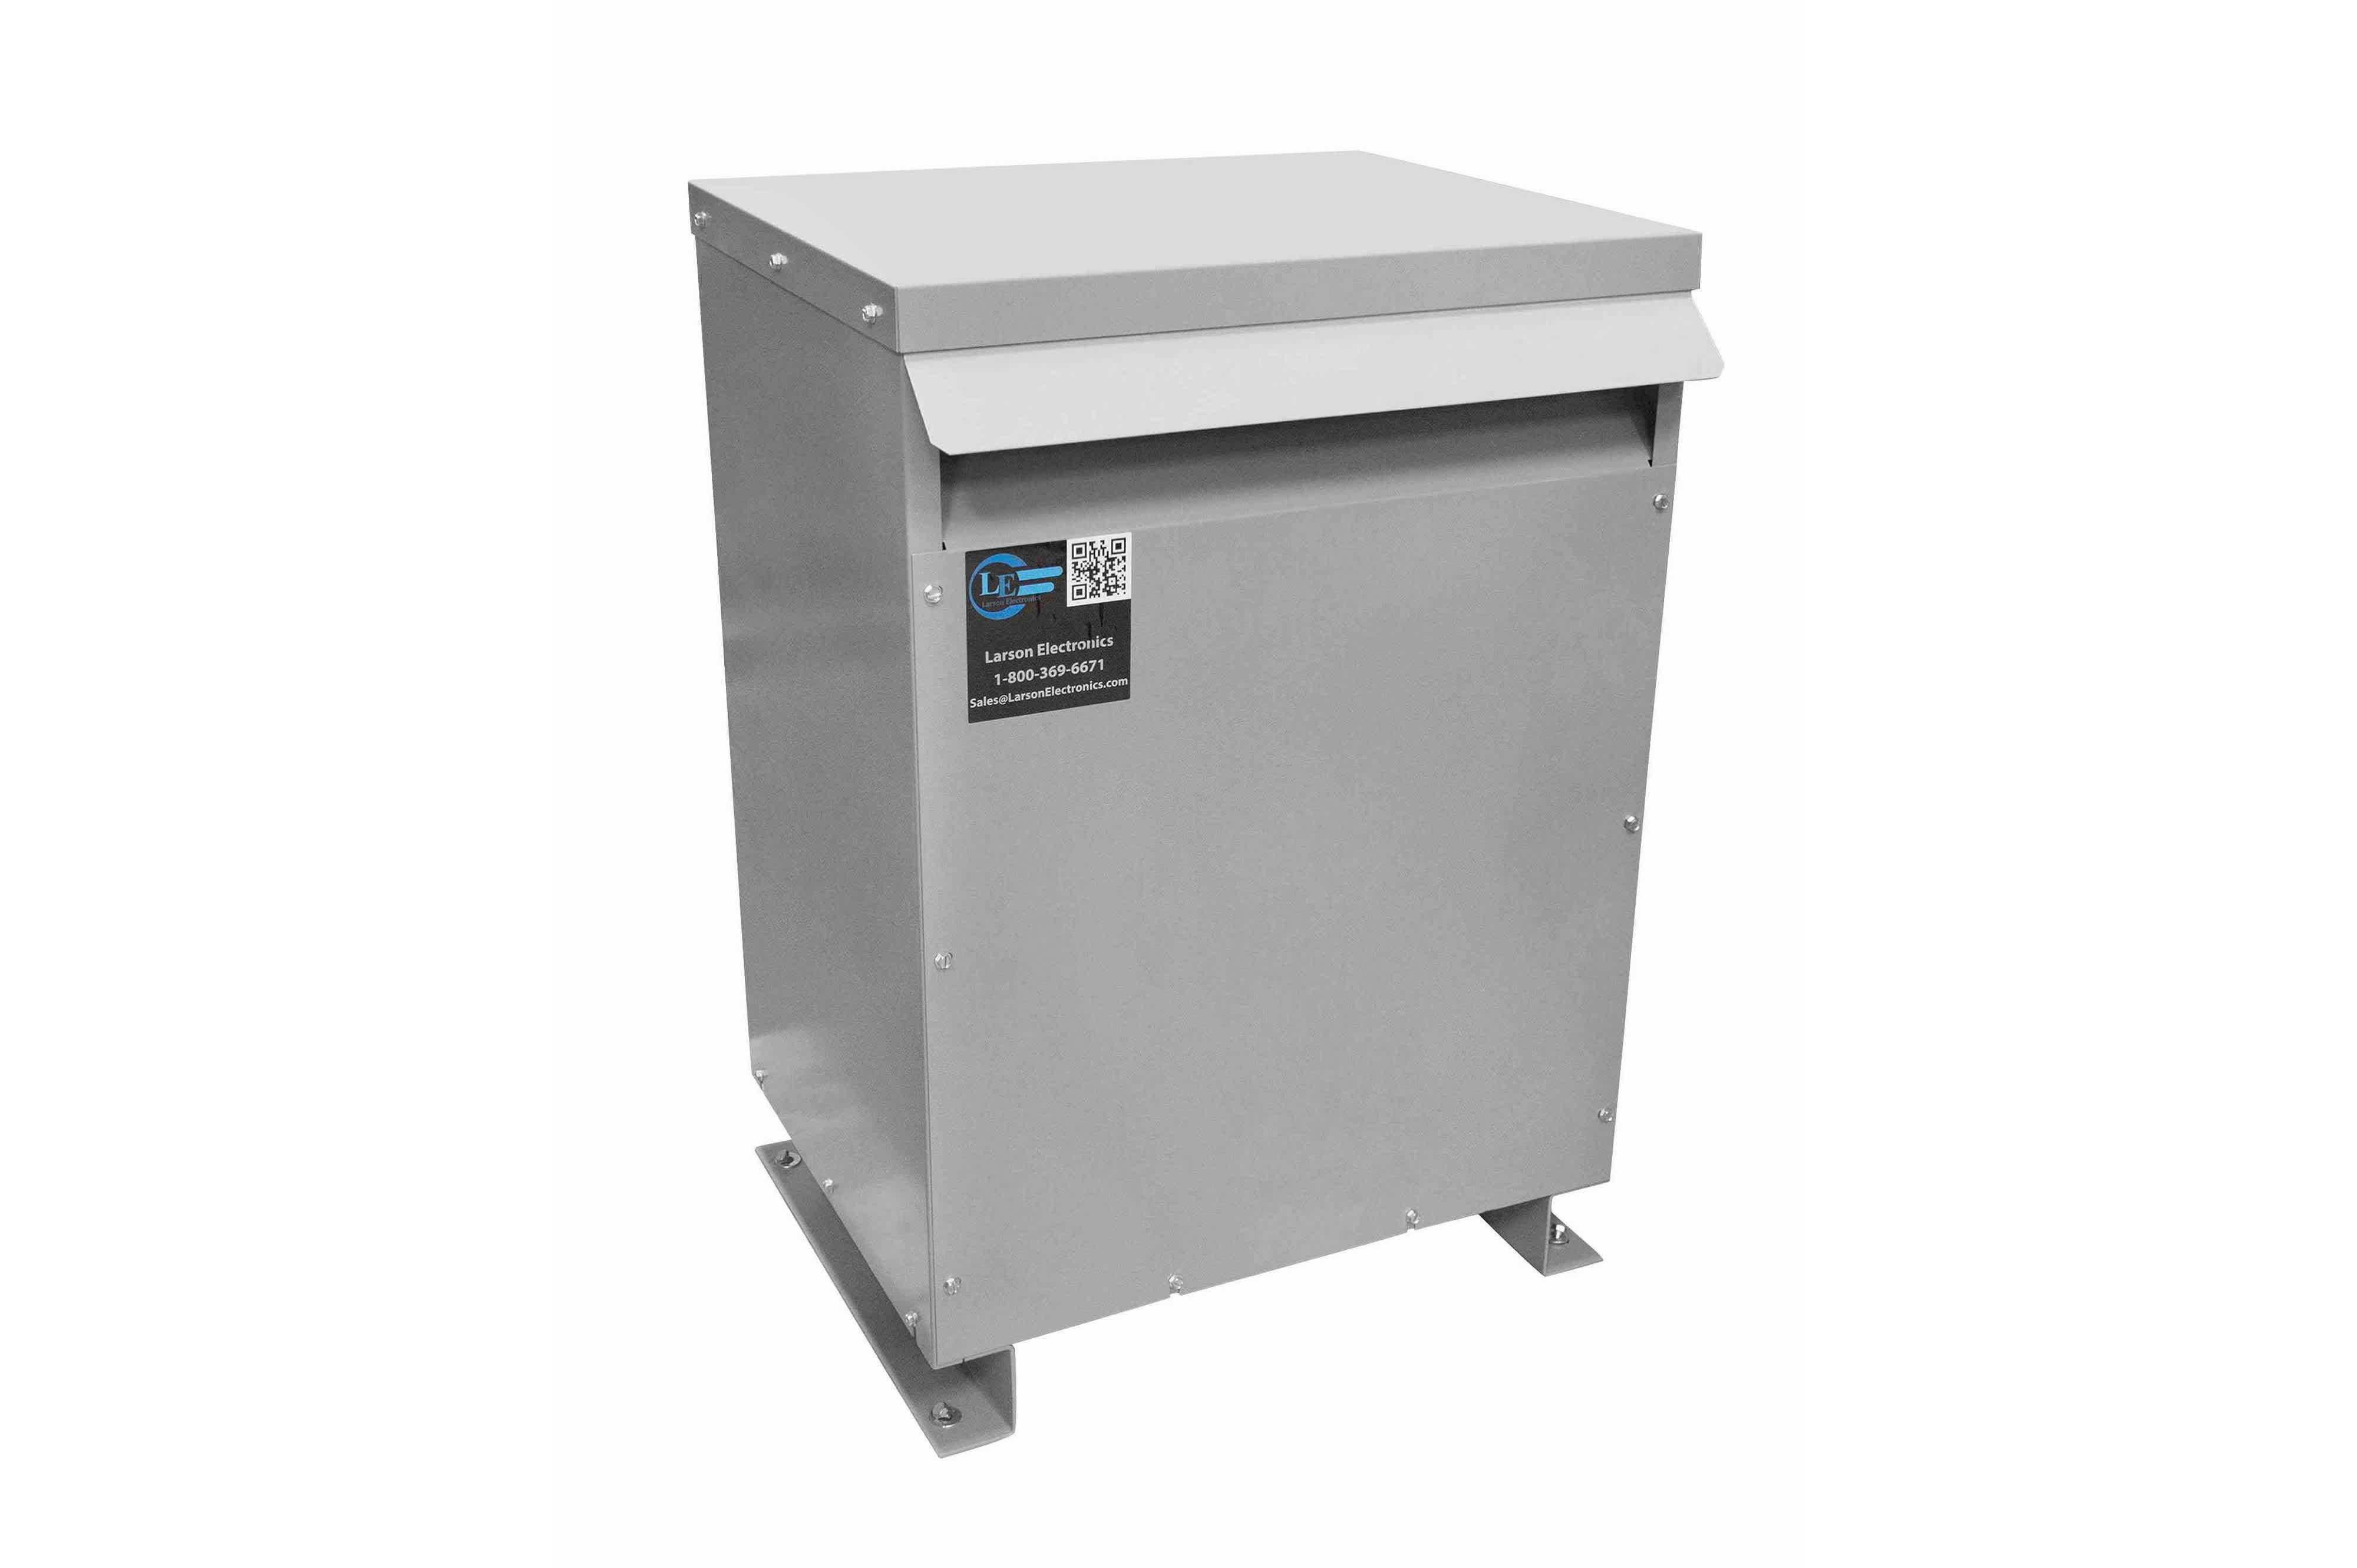 42.5 kVA 3PH Isolation Transformer, 600V Wye Primary, 460V Delta Secondary, N3R, Ventilated, 60 Hz